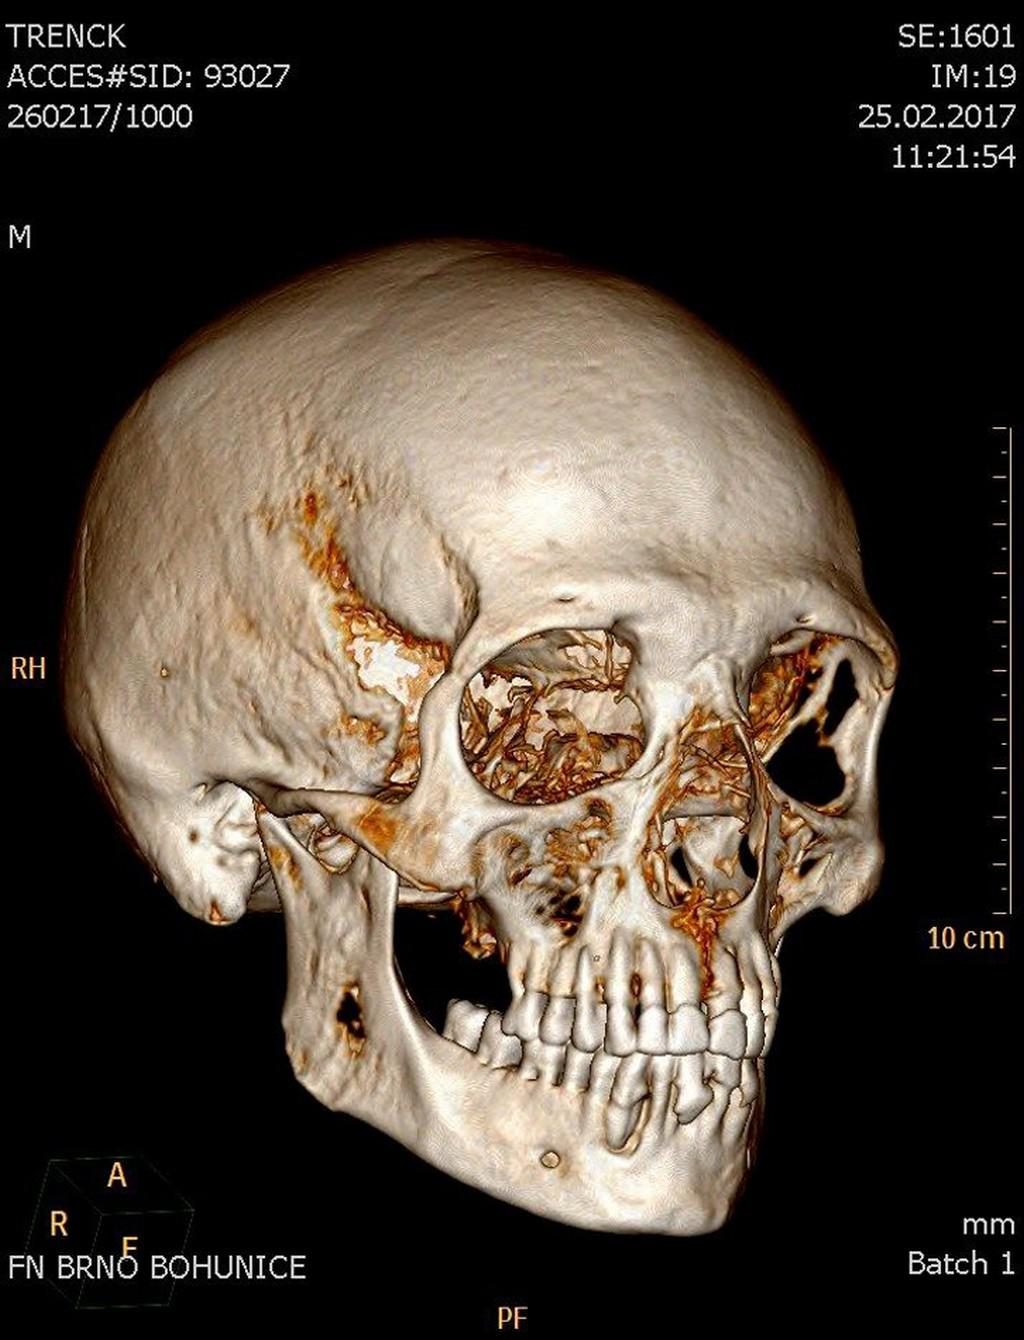 Snímek lebky mumie barona Trencka